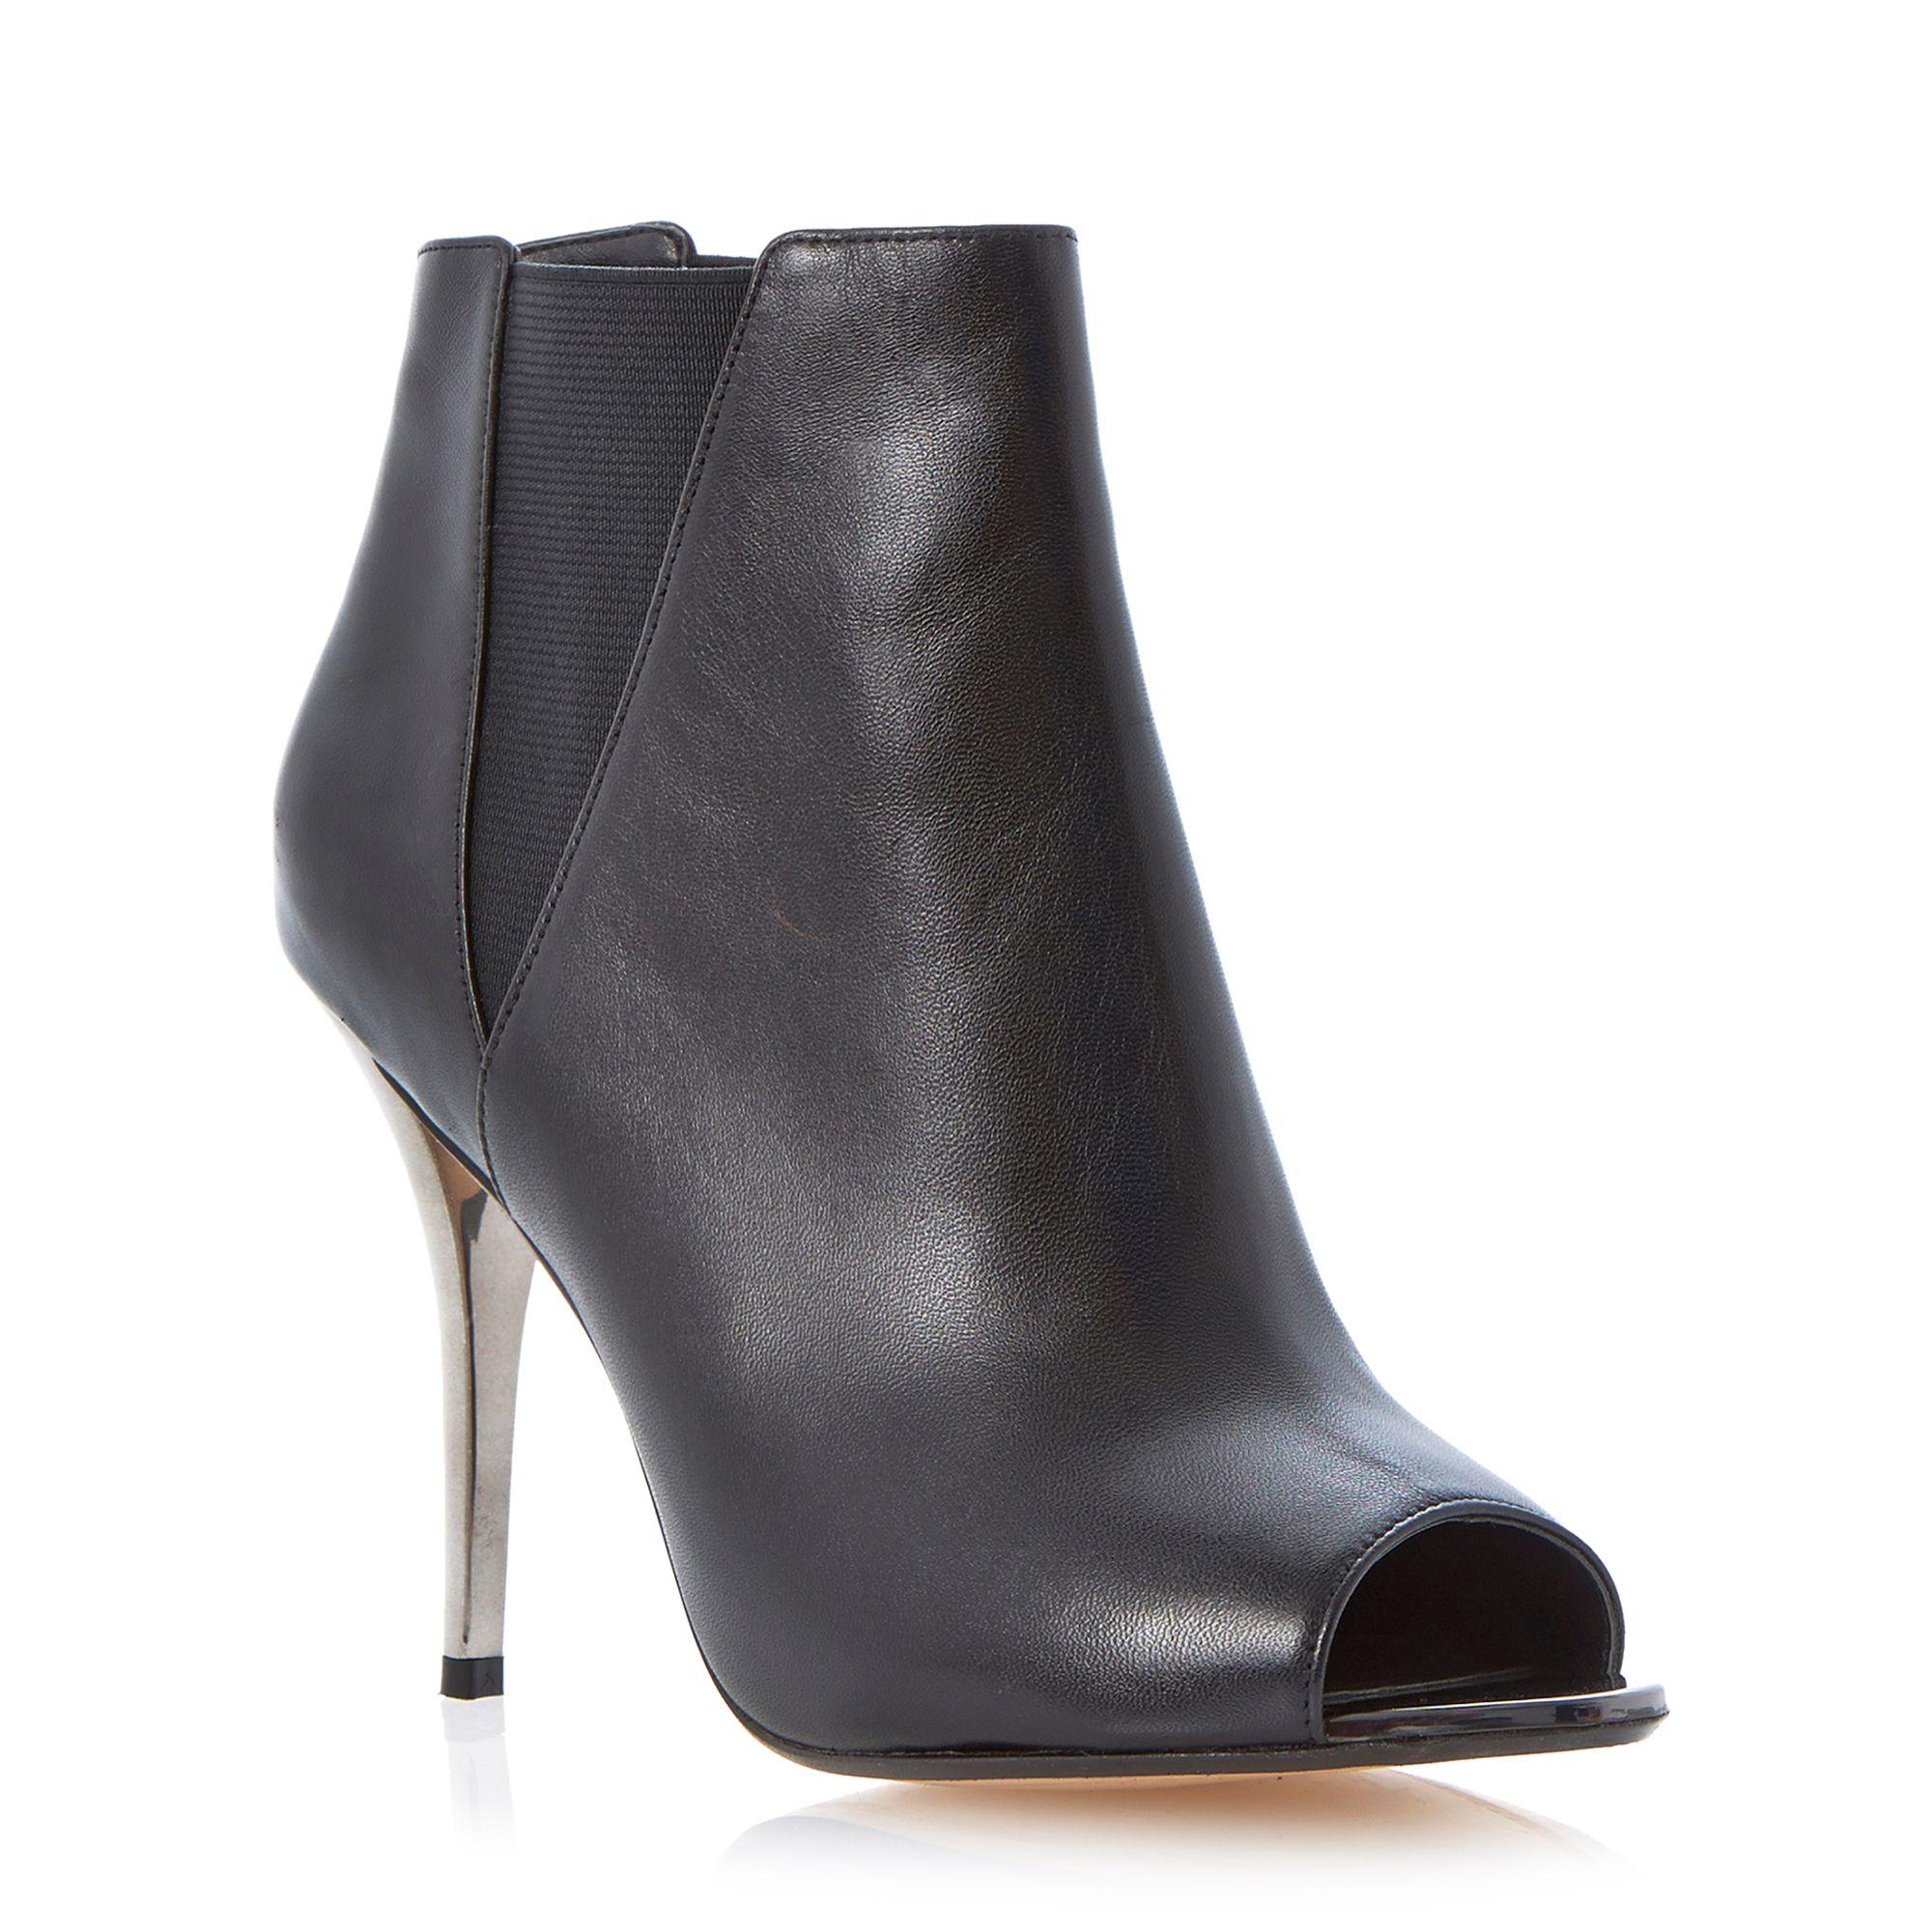 dune cynthia peep toe shoe boot in black black leather